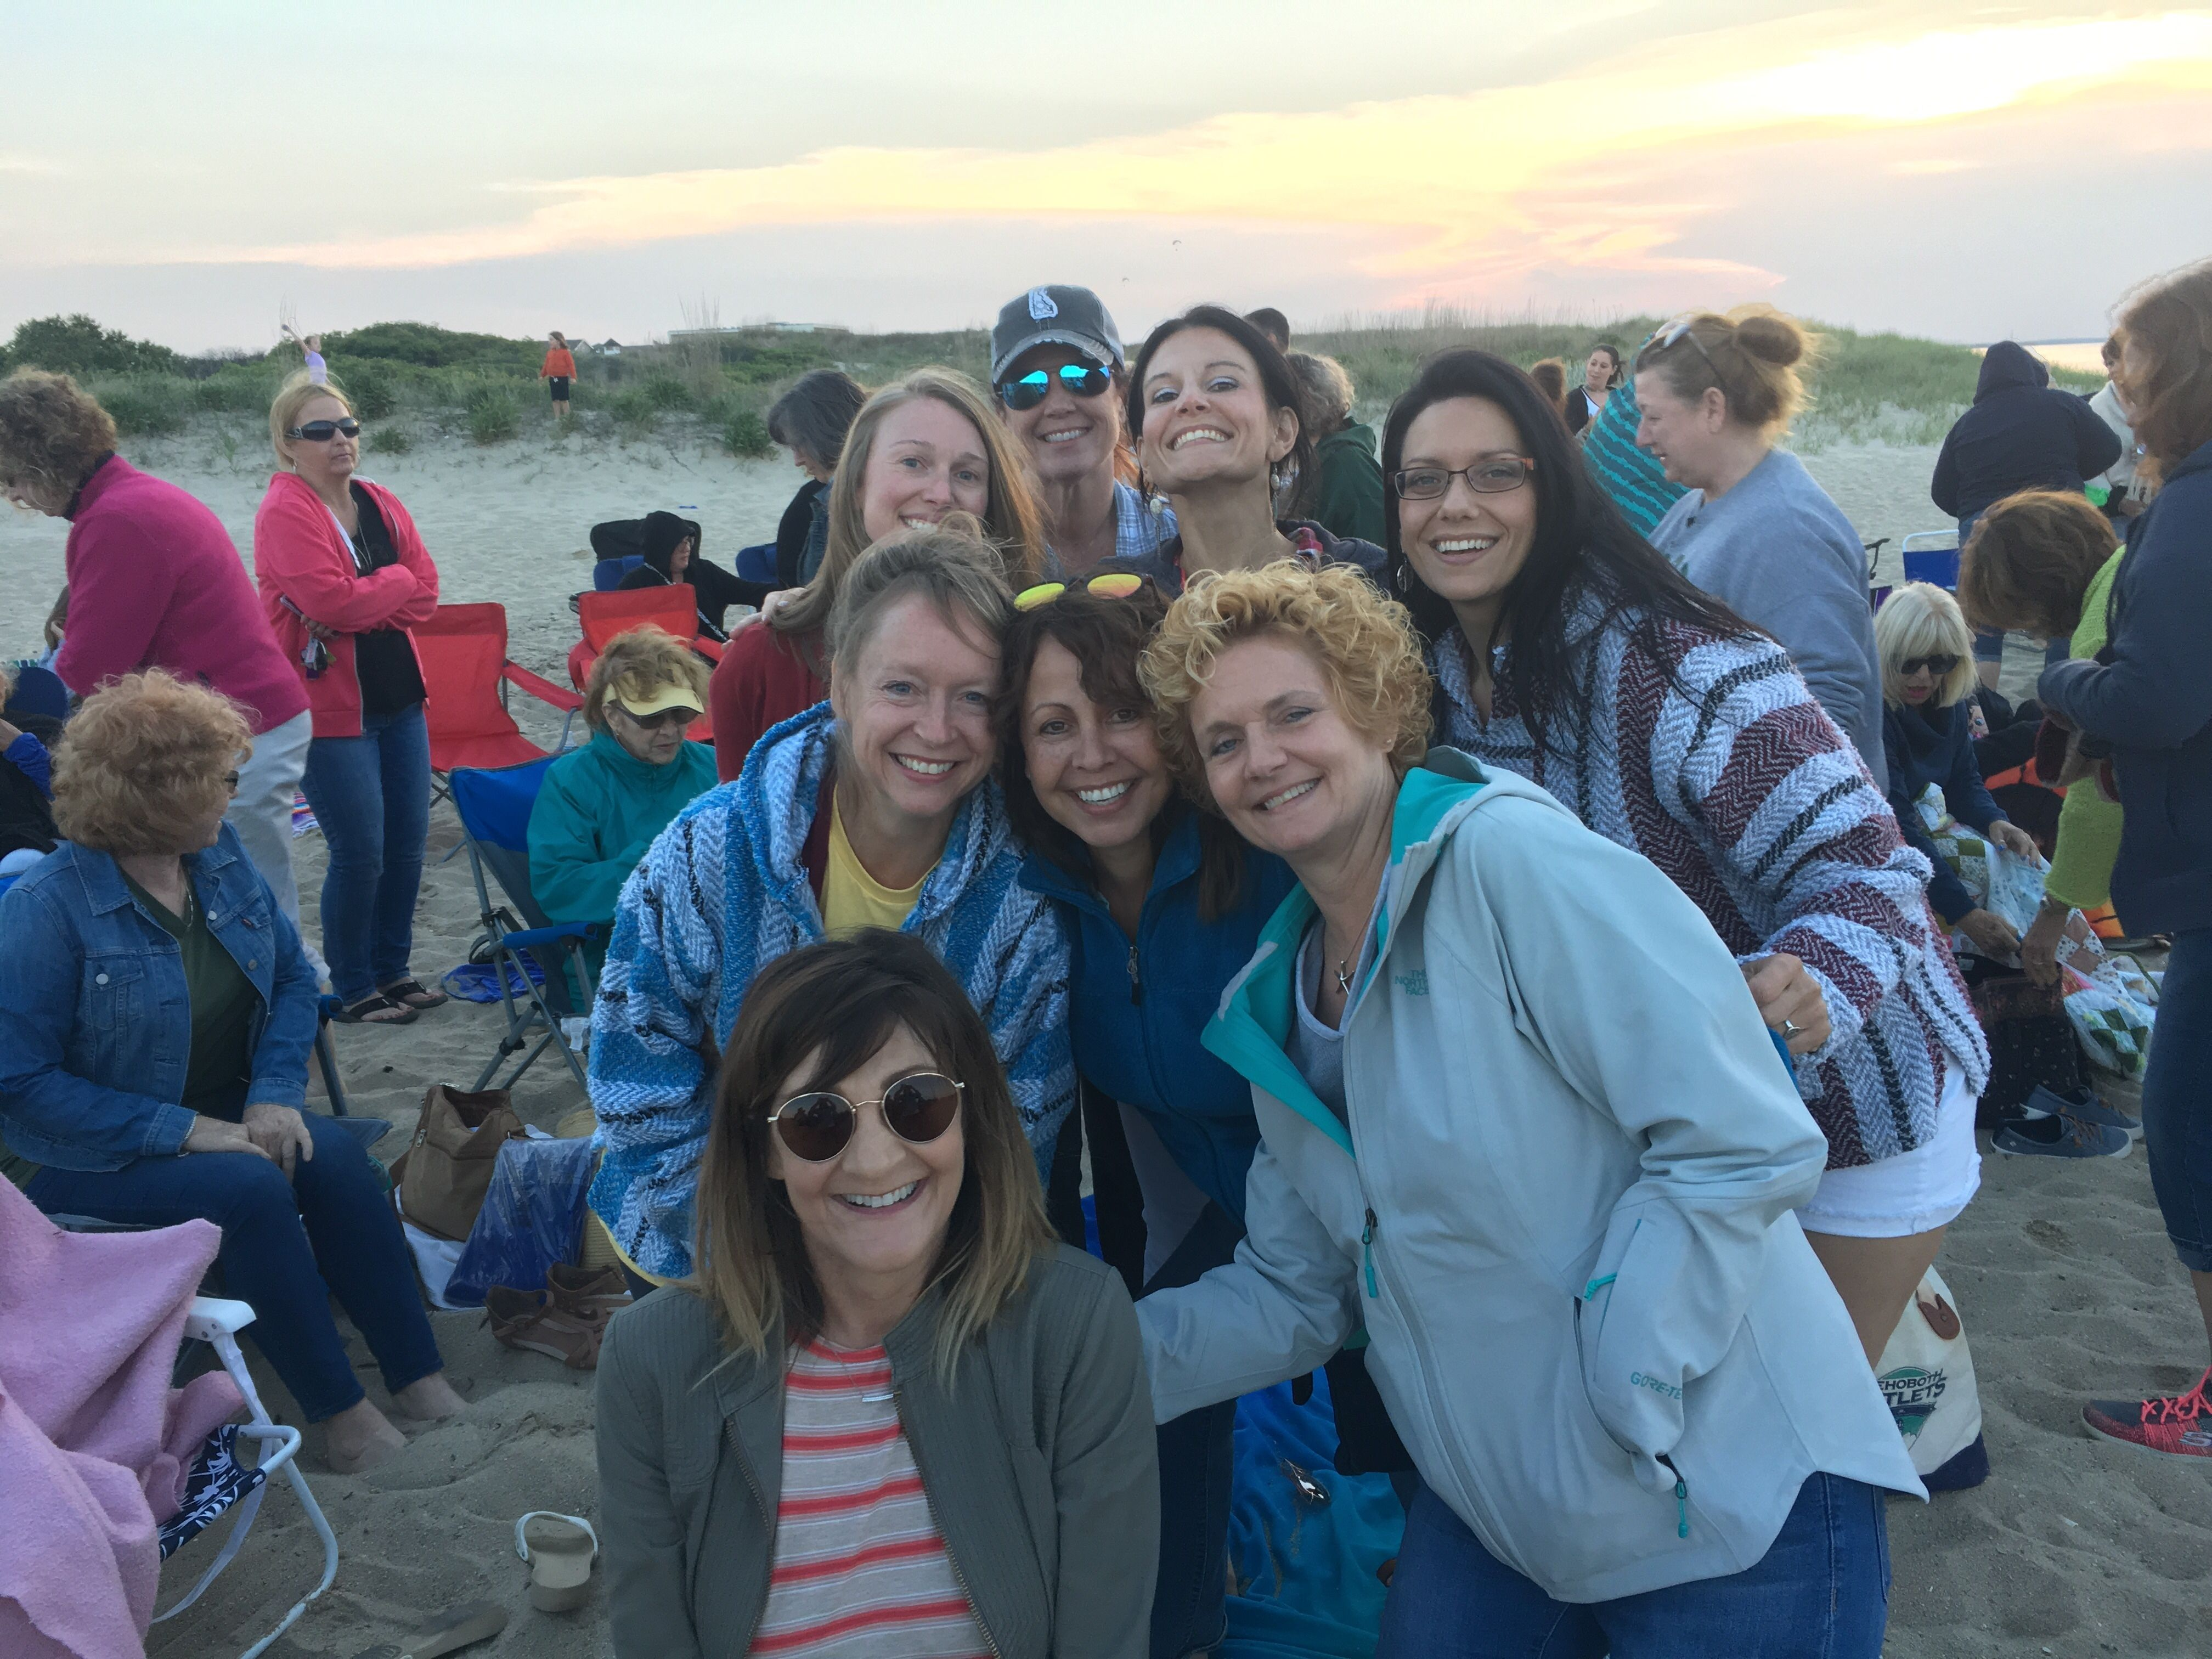 Women's Drinks & Adventure Group